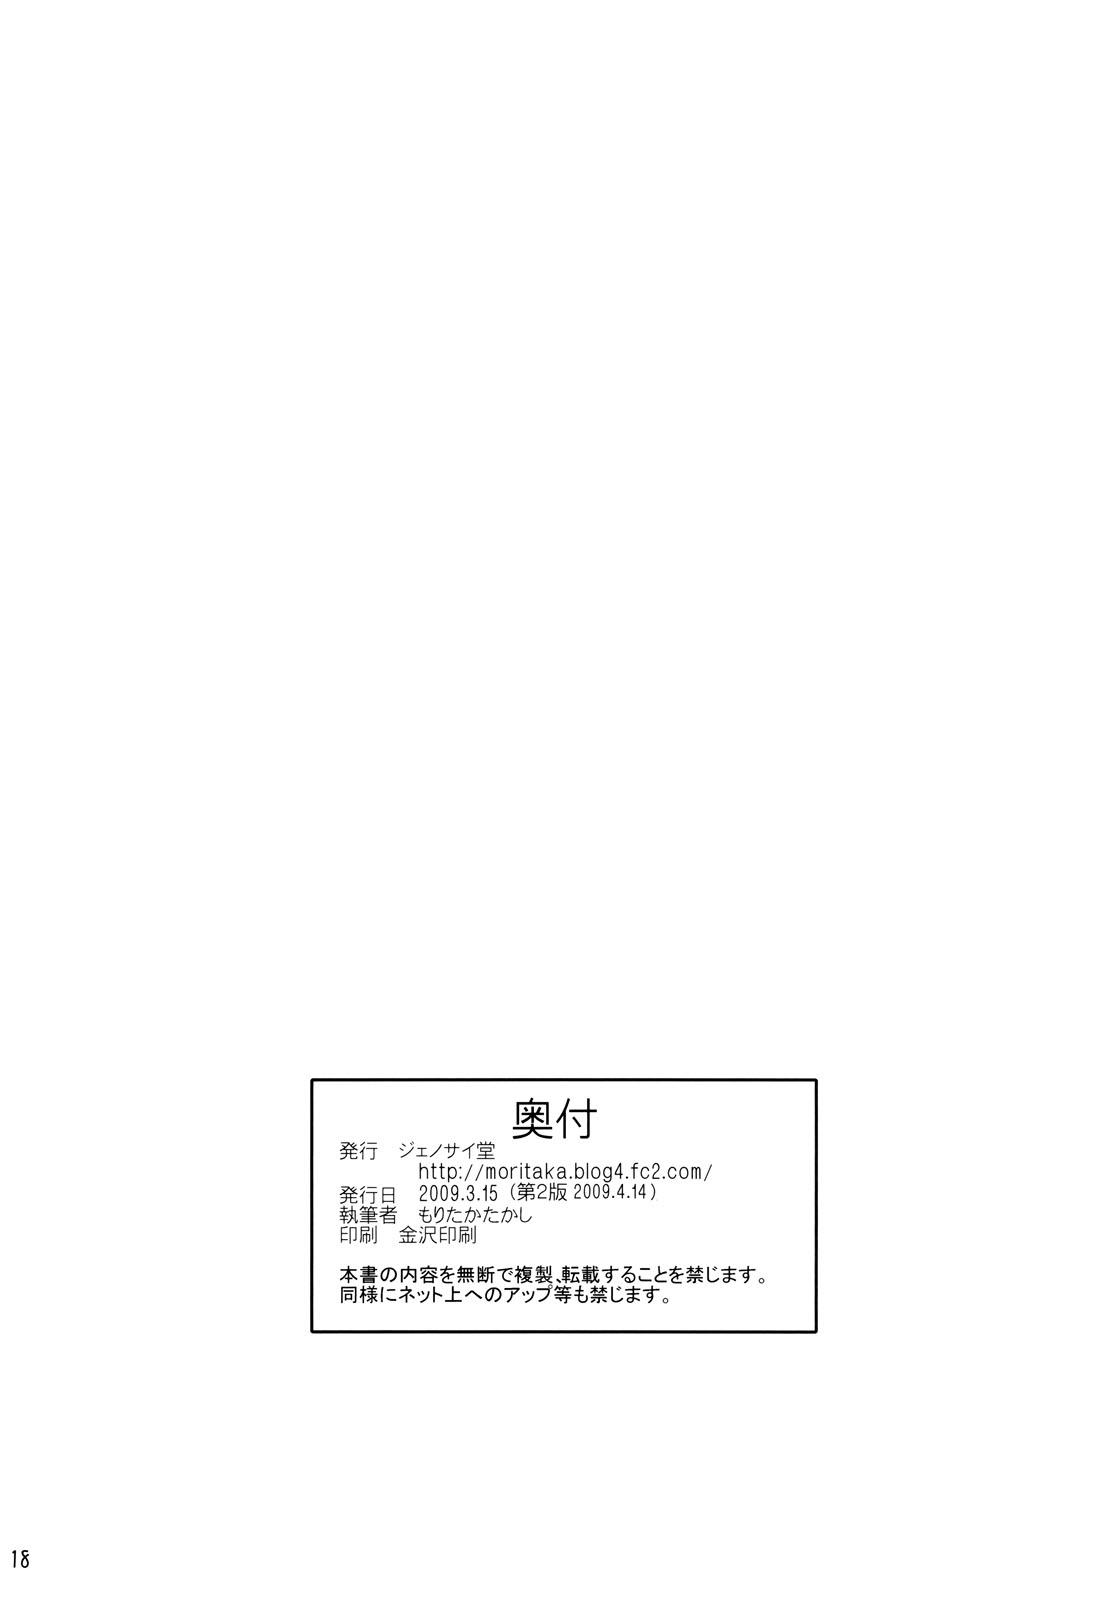 DoujinReader.com arcanajuice3_018